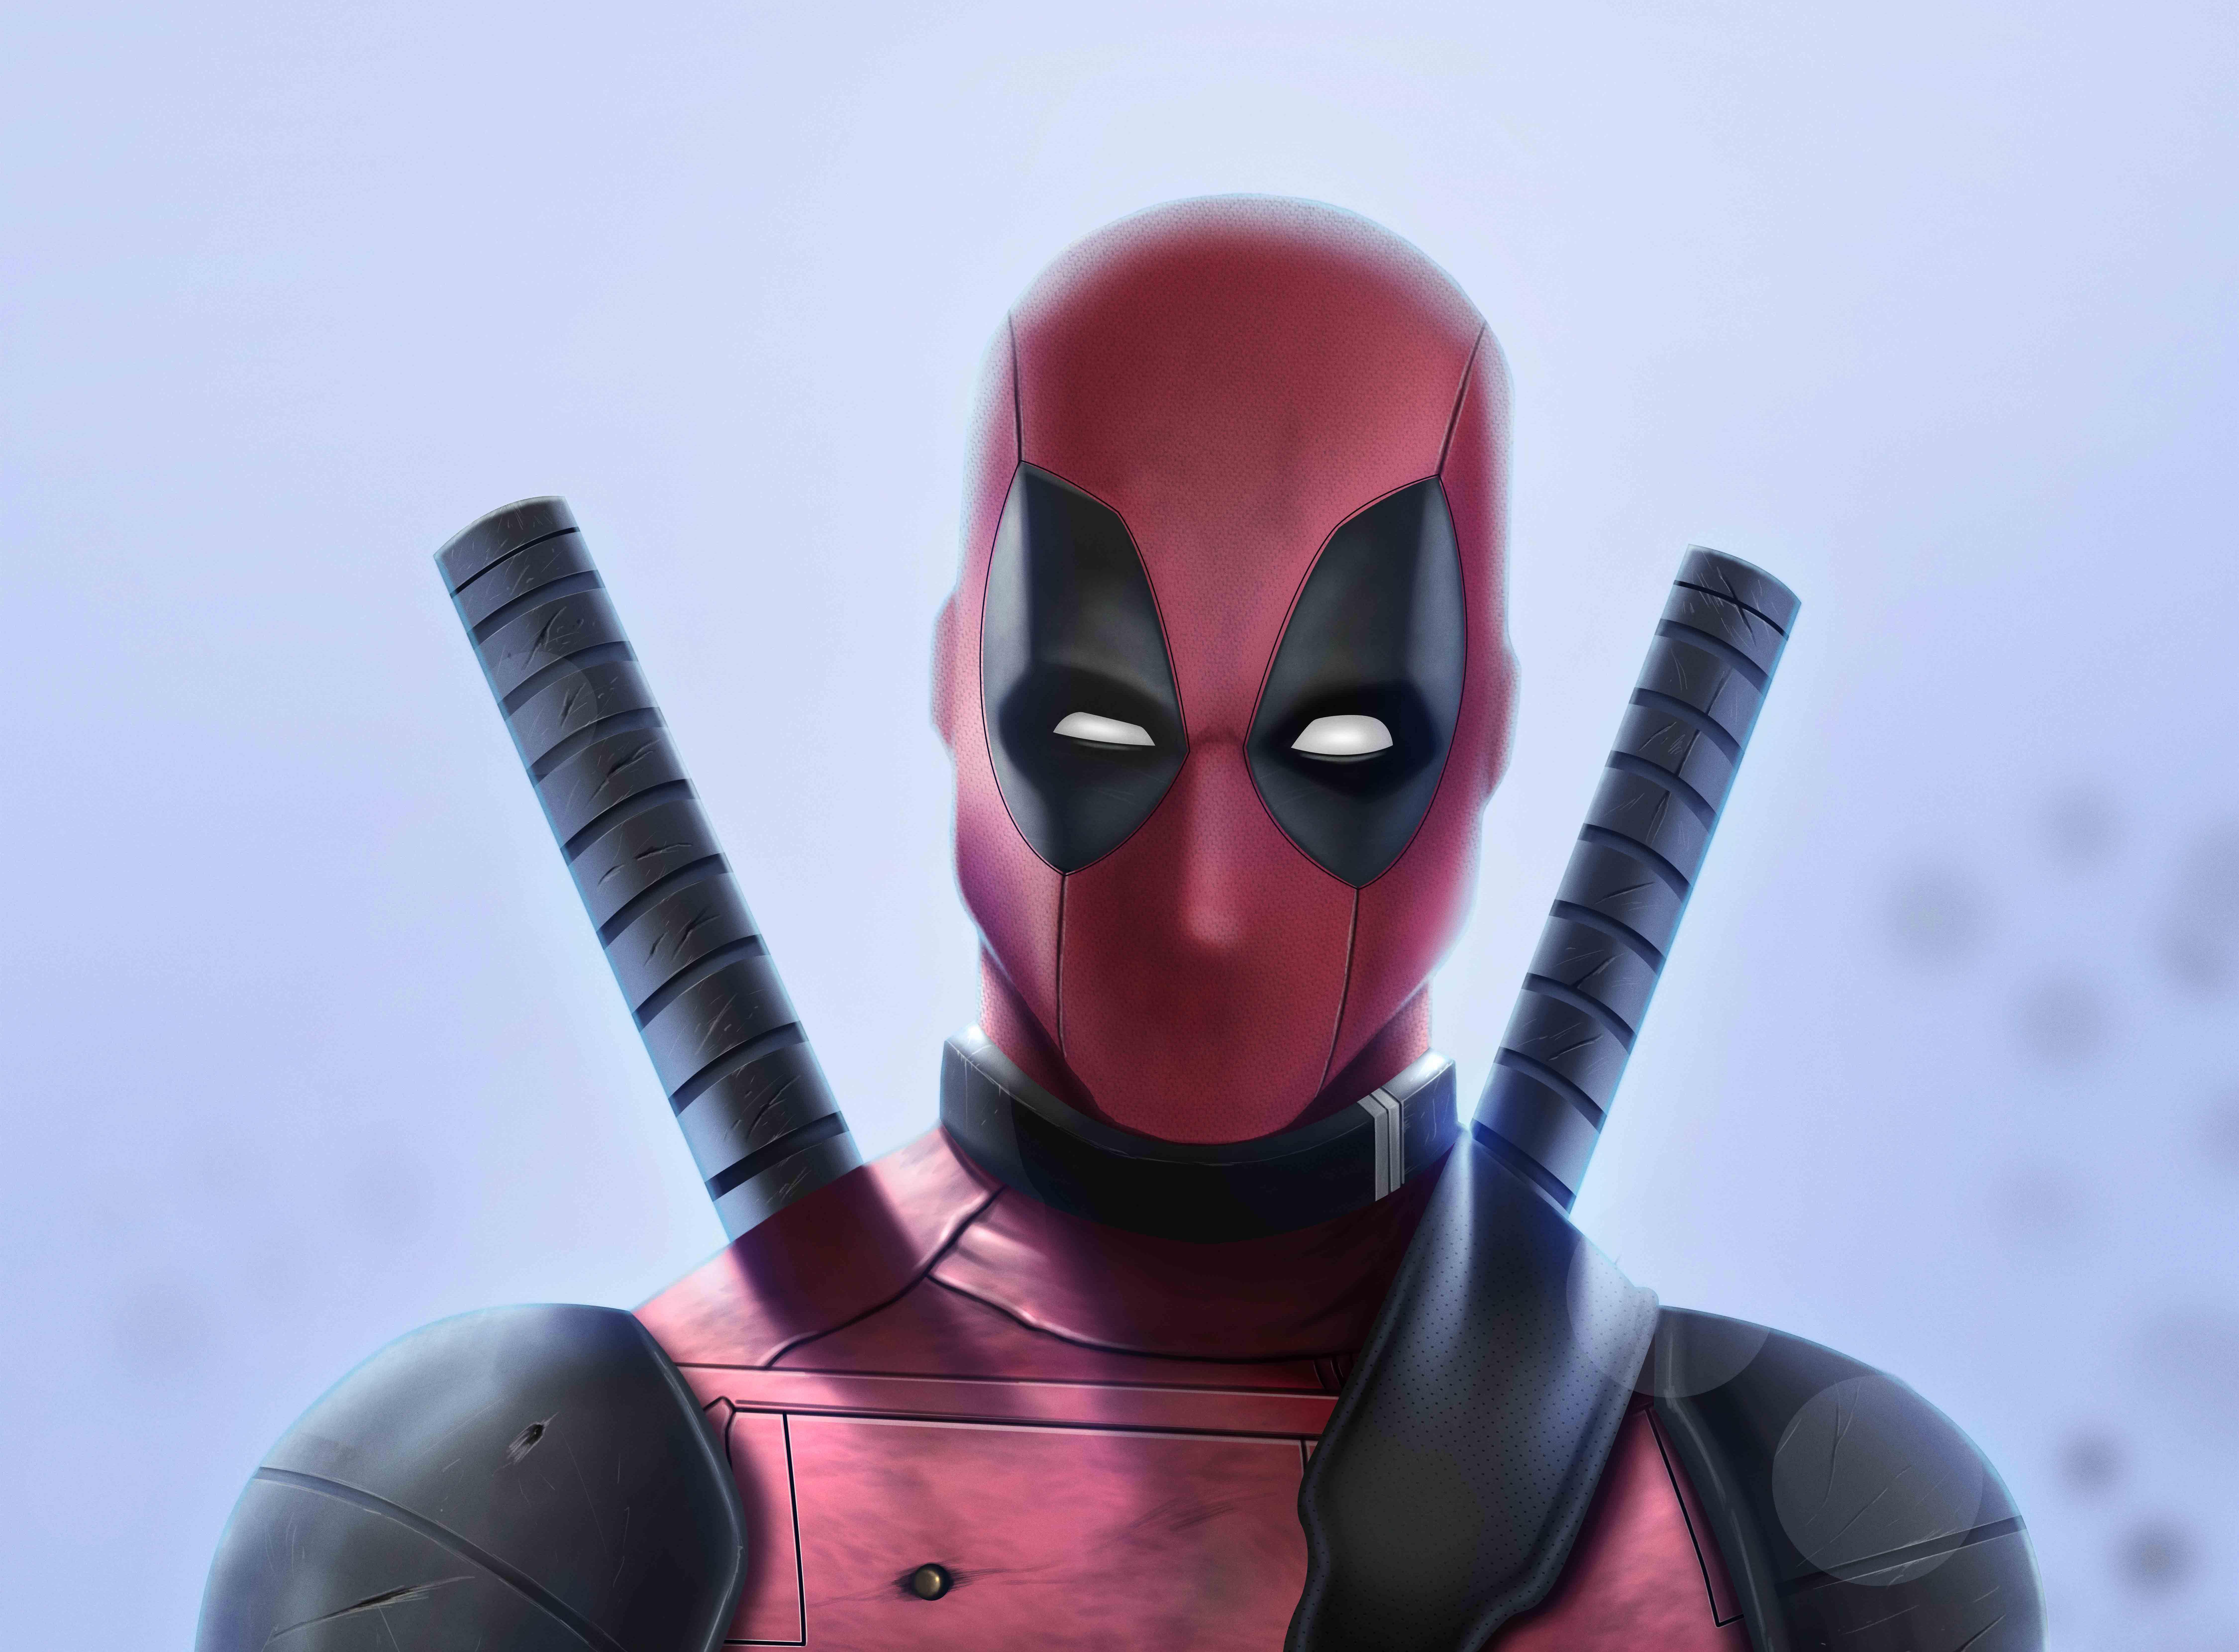 1080x1920 Daredevil Minimalism Iphone 7 6s 6 Plus Pixel: 1080x1920 Deadpool 10k Artwork Iphone 7,6s,6 Plus, Pixel